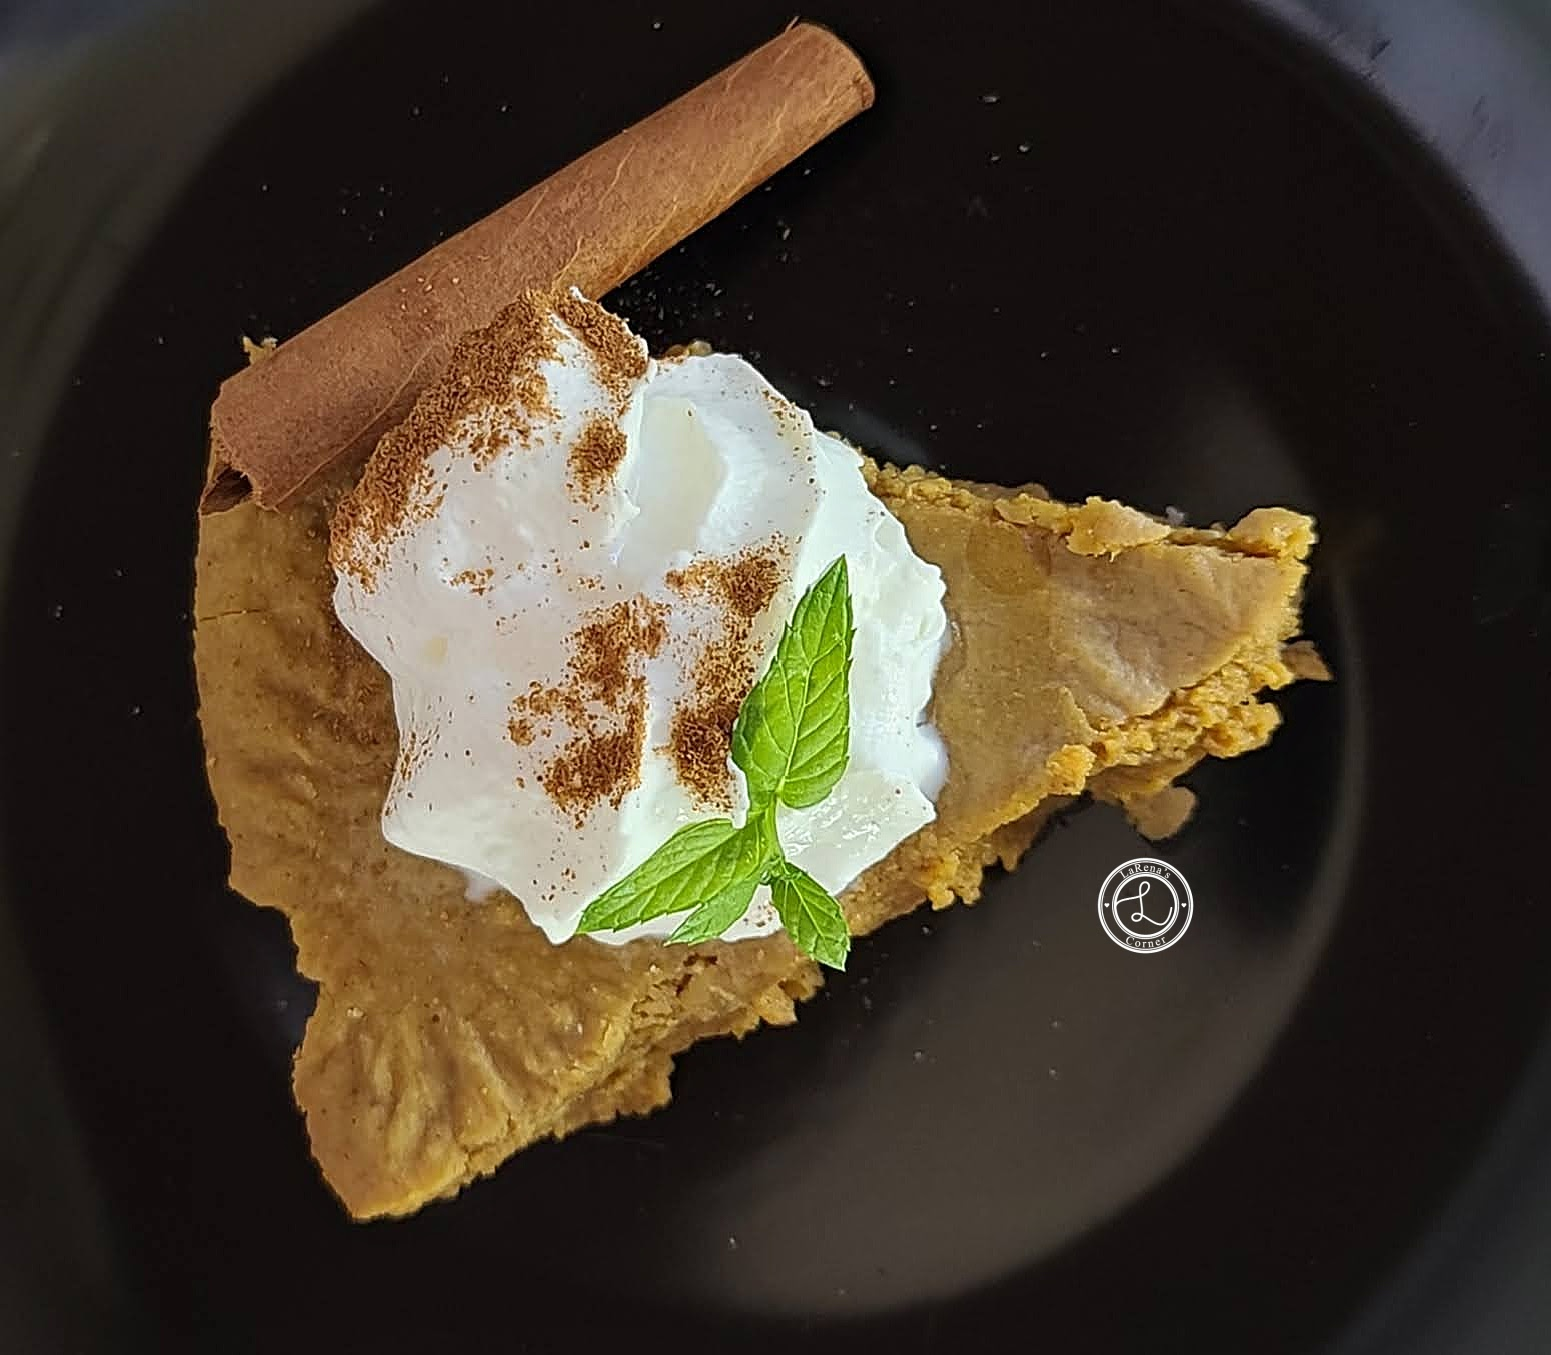 Piece of Gluten-Free Crustless Pumpkin Pie with whipped cream, cinnamon, mint, and cinnamon stick